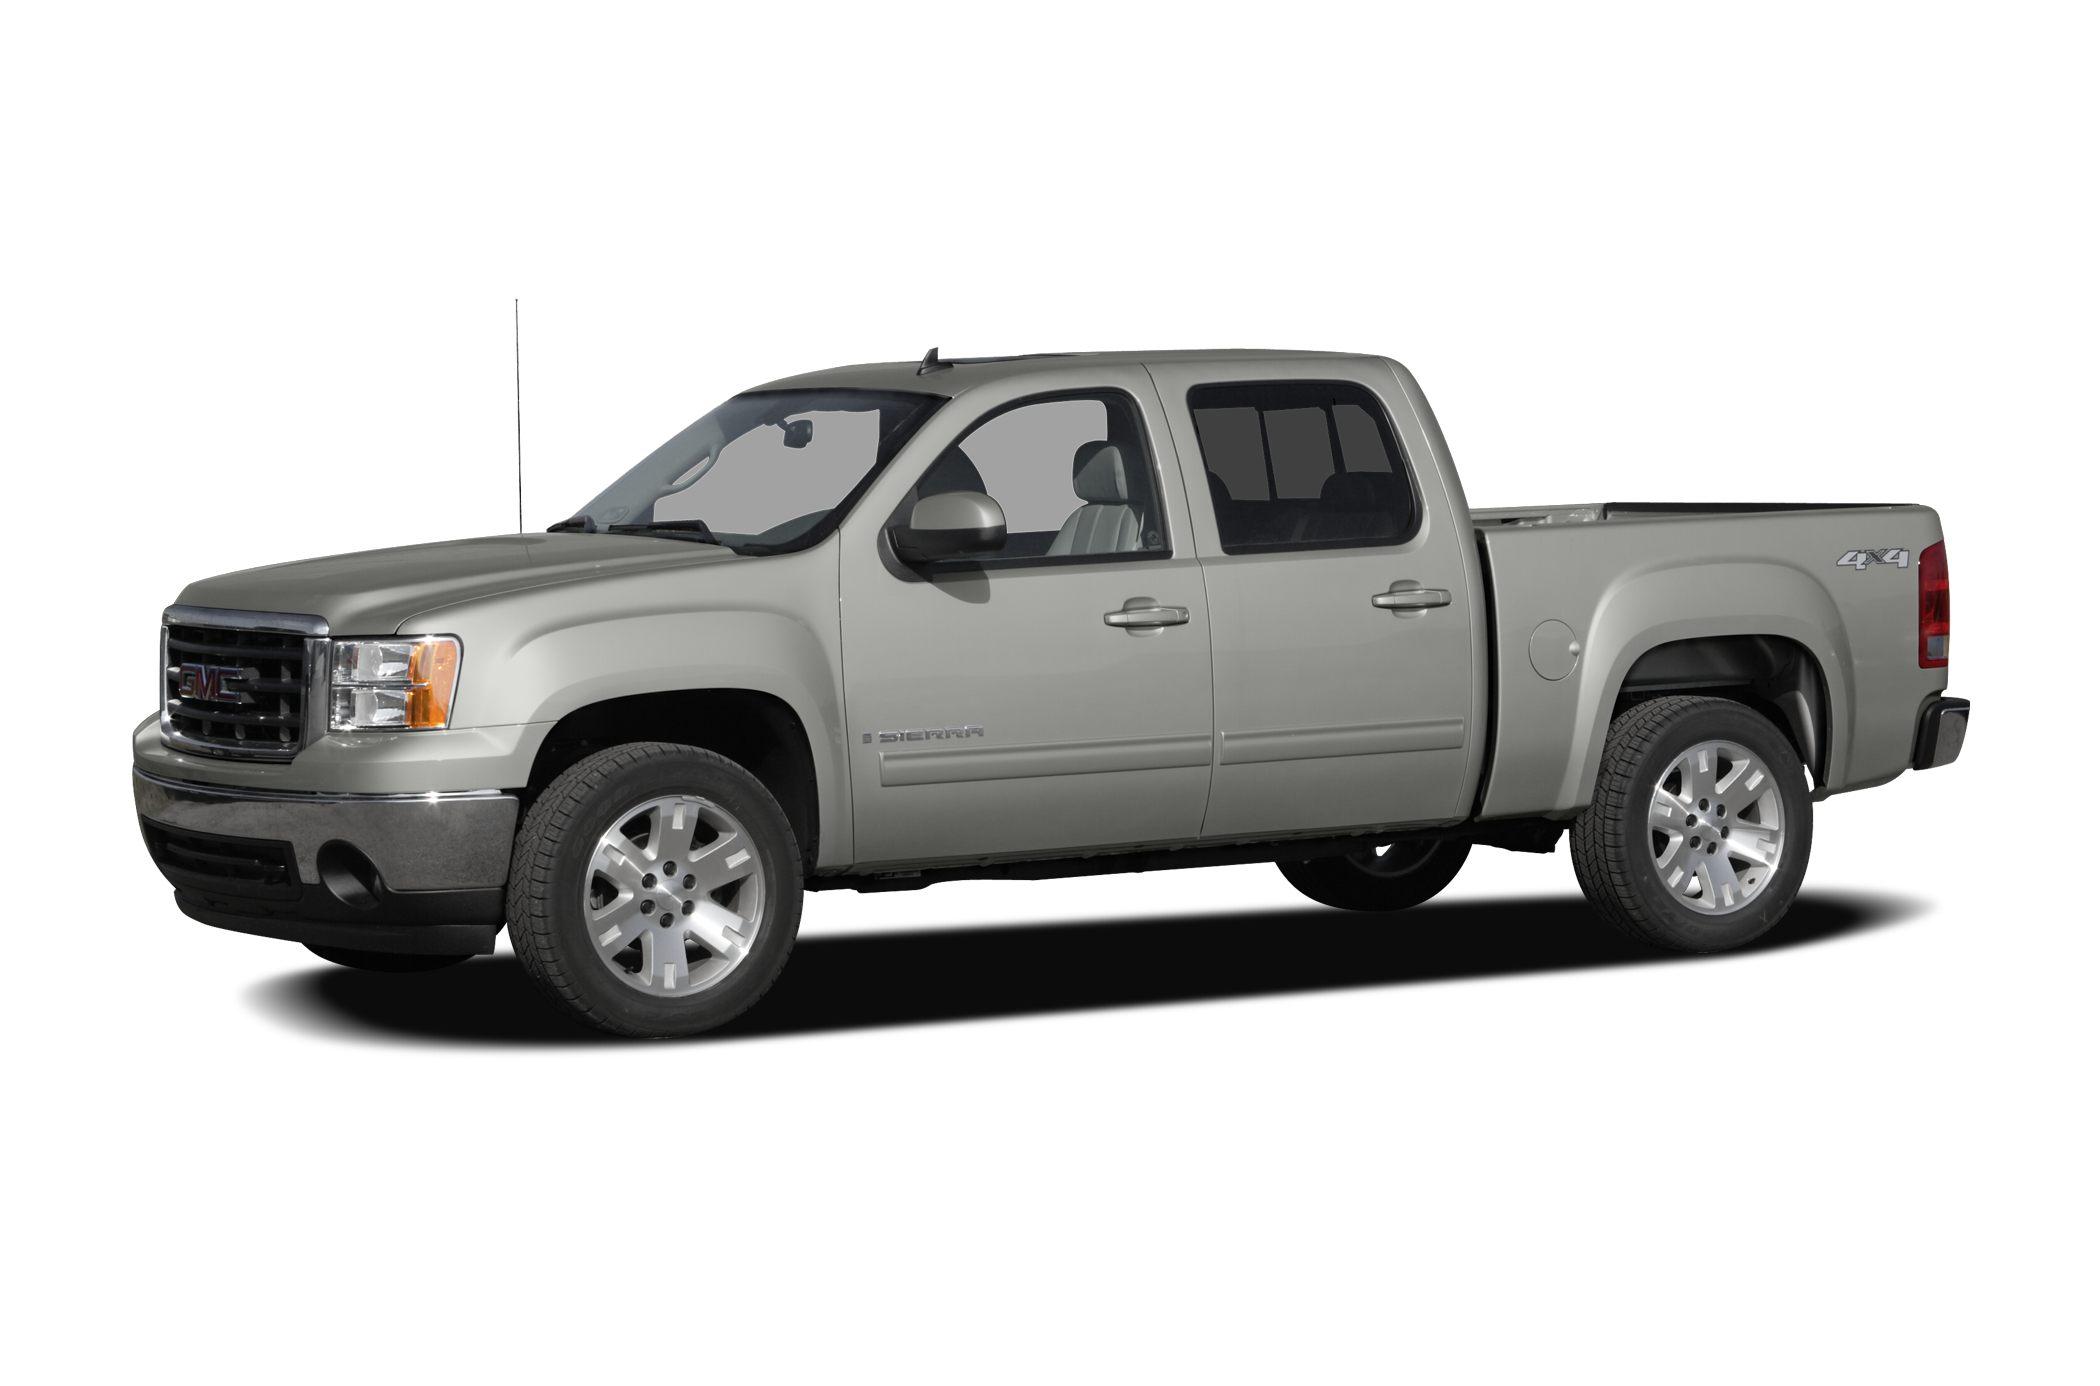 2007 GMC Sierra 1500  Miles 193512Stock 1115B VIN 2GTEC13J771568834